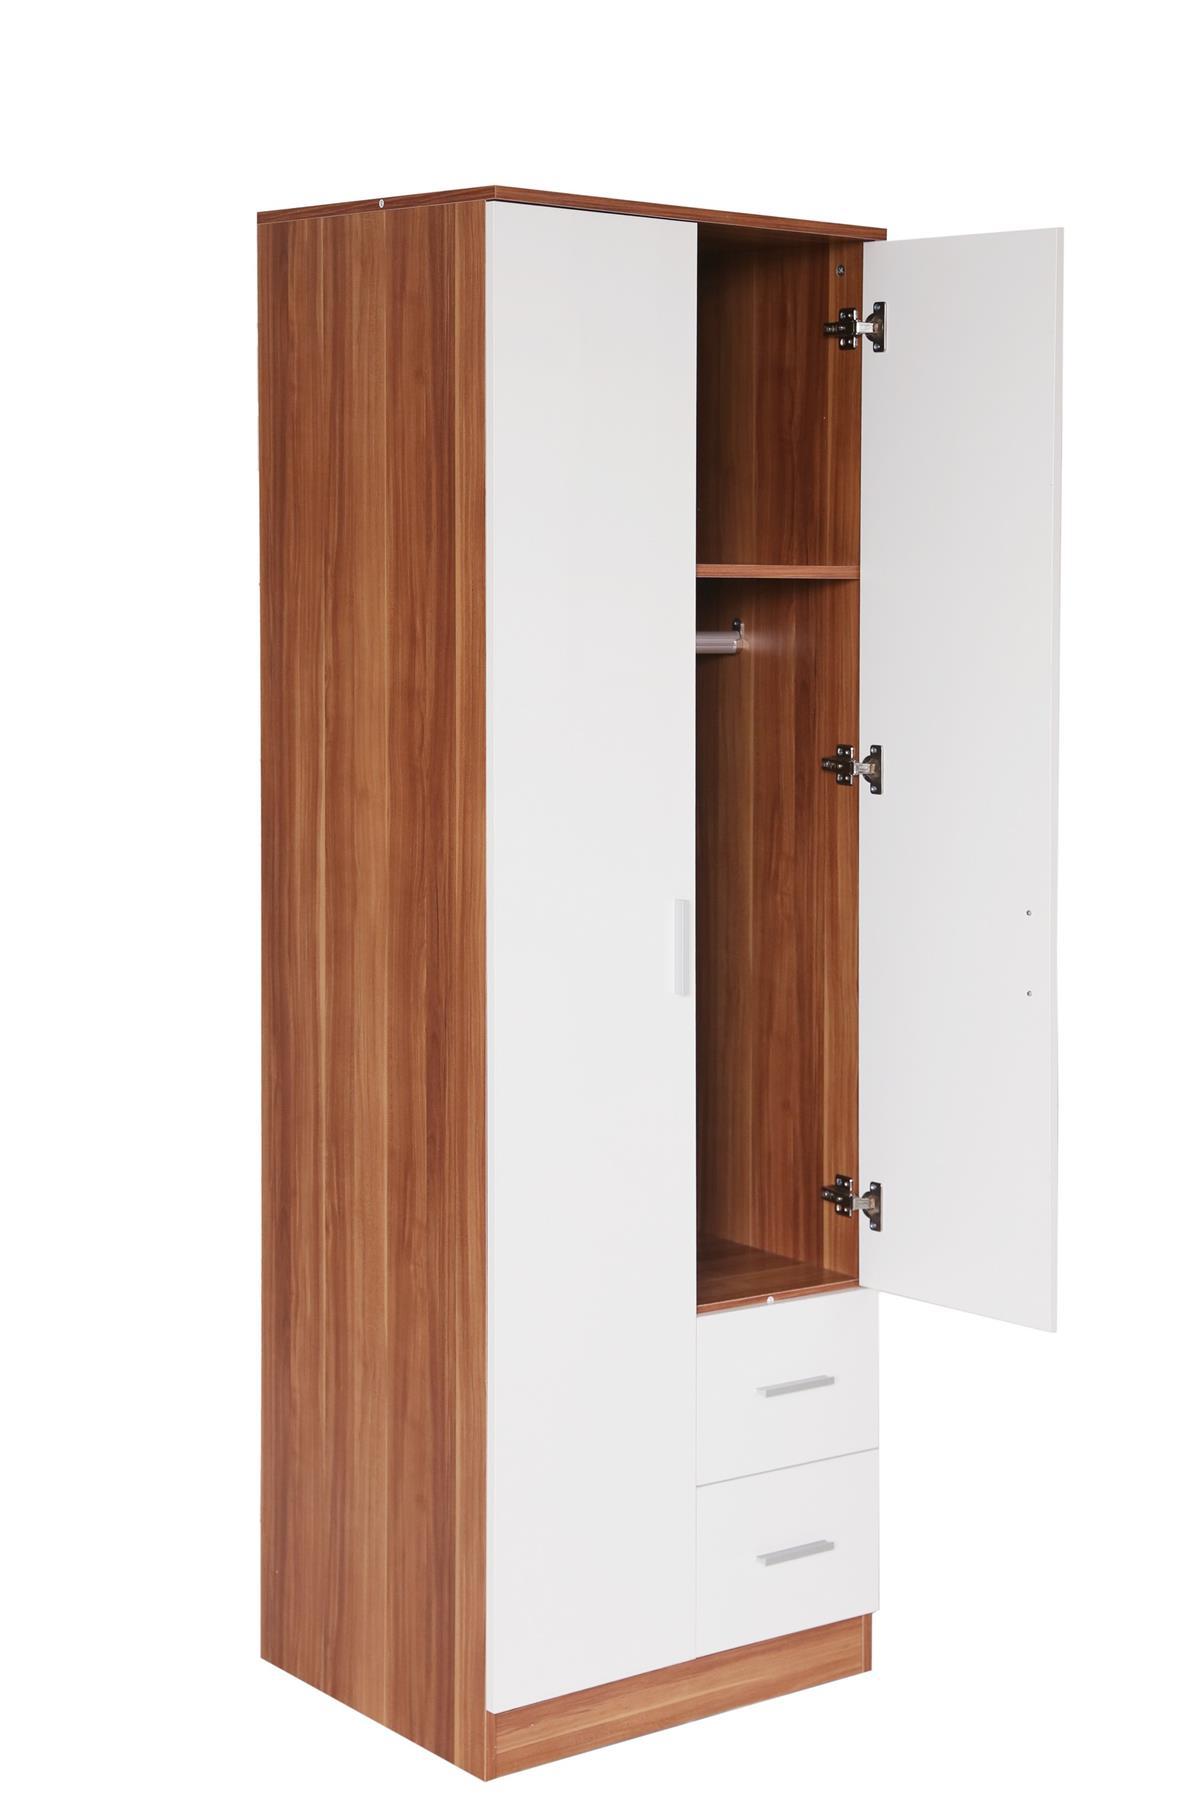 Bedroom Furniture High Resolution: HIGH GLOSS 3 PIECE BEDROOM FURNITURE SET